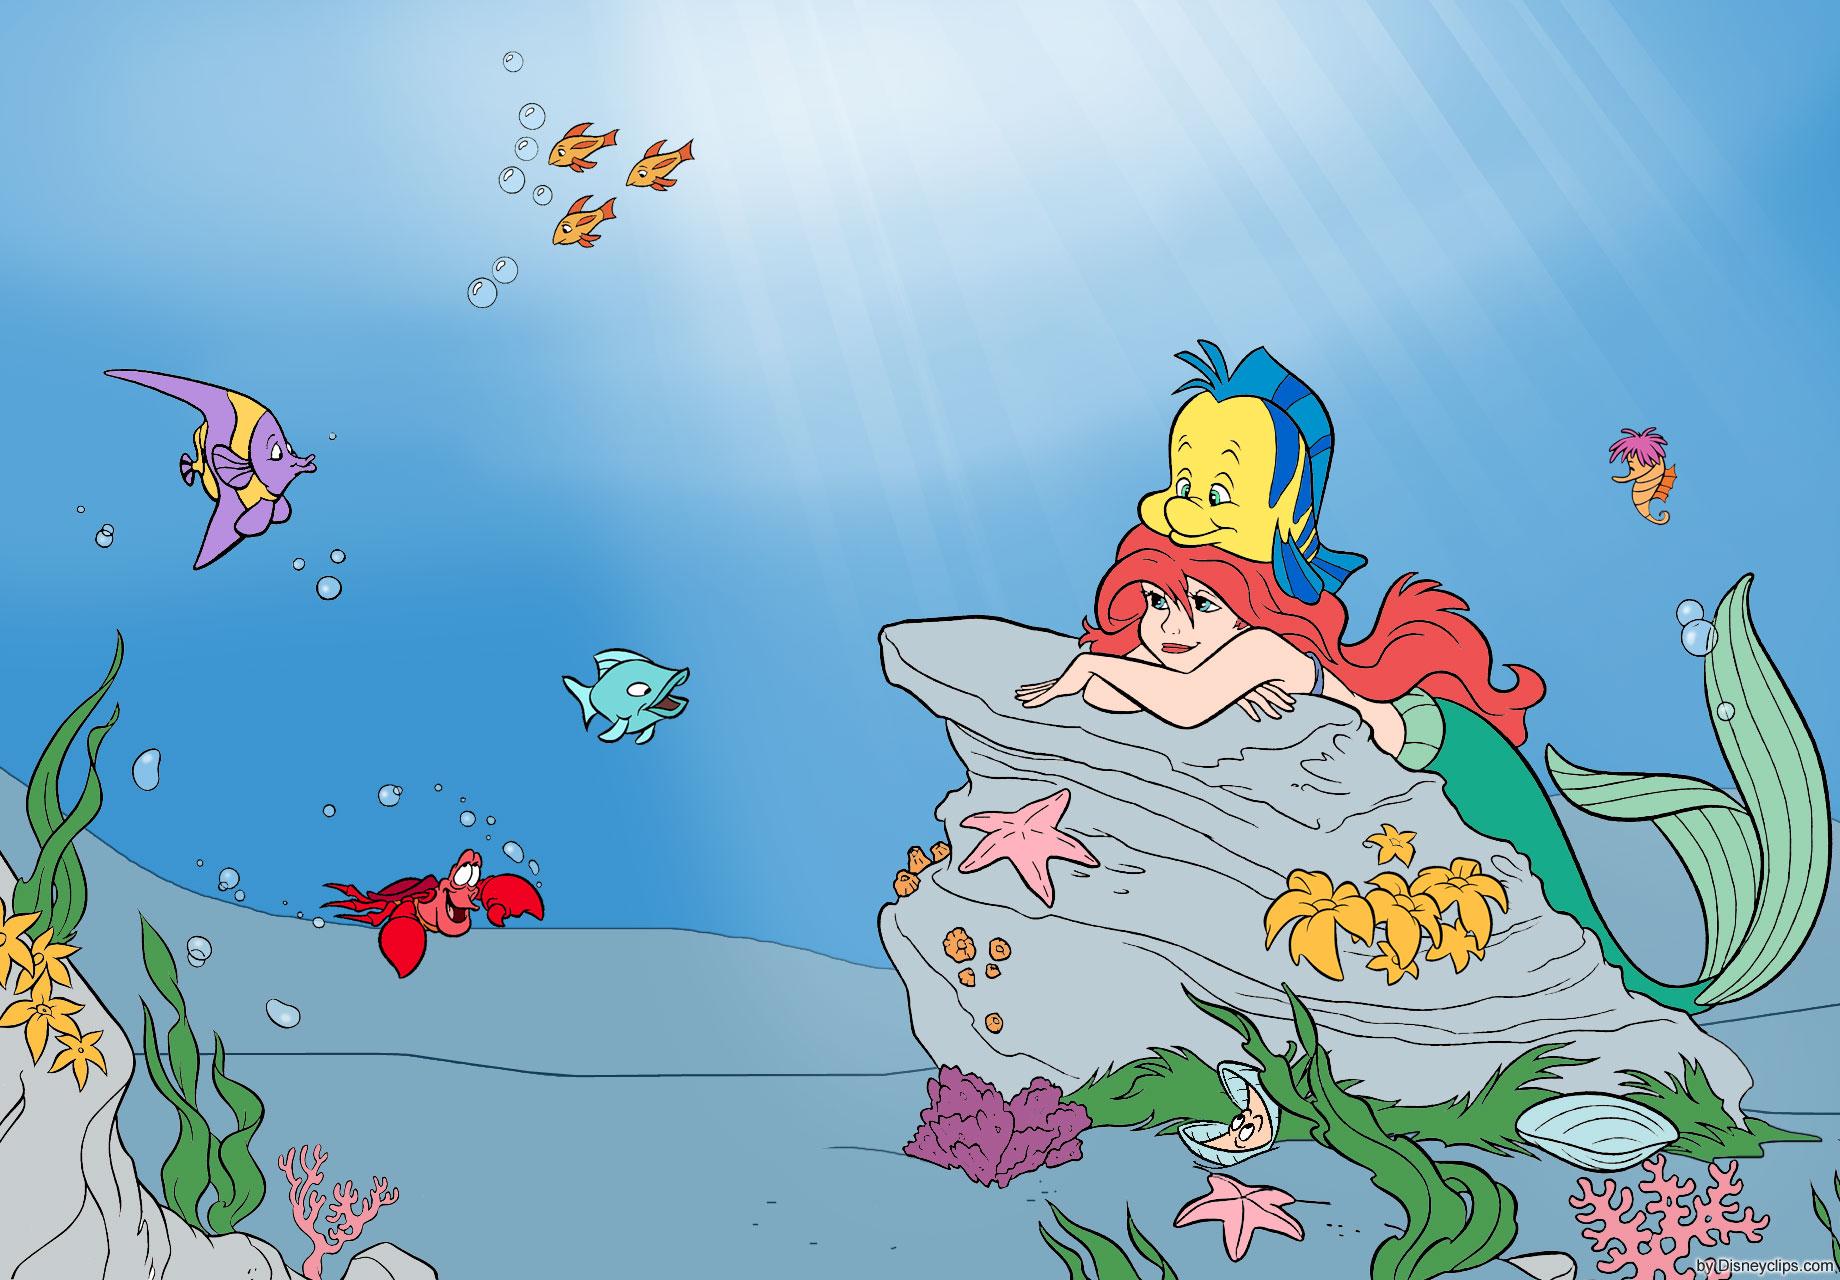 The Little Mermaid Wallpaper Disneyclipscom